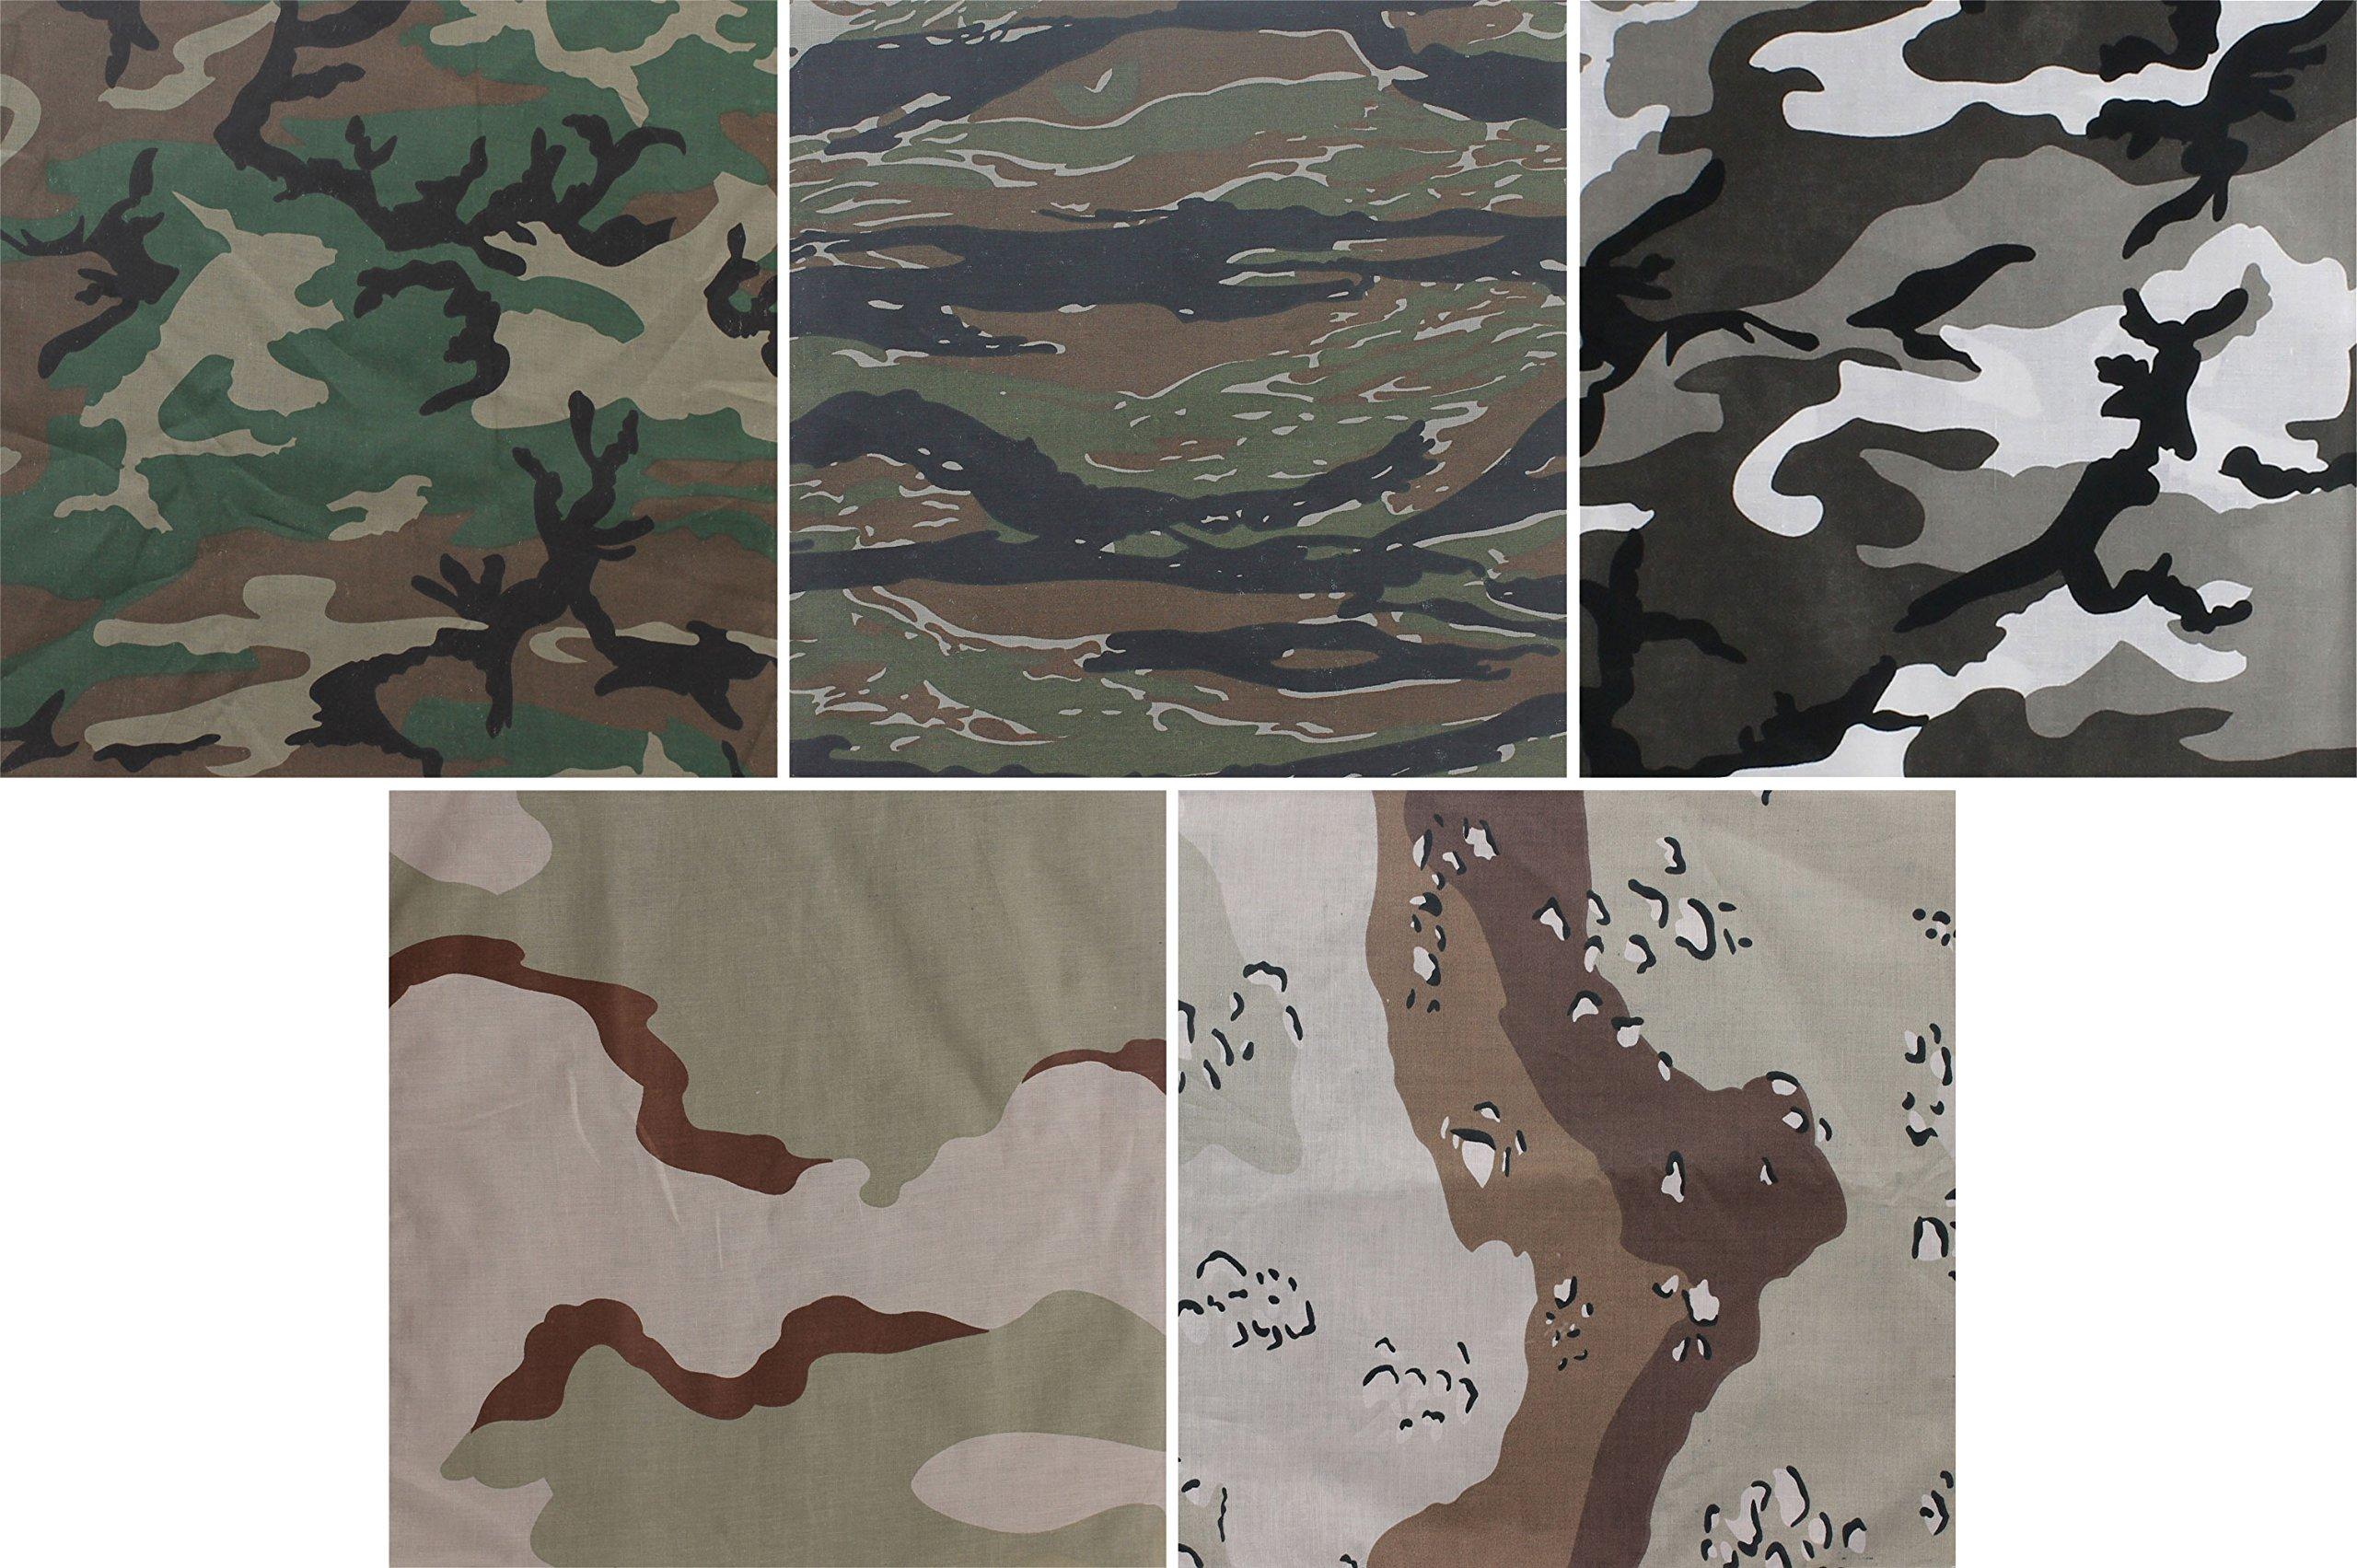 5 Pack - Jumbo Bandanas Camouflage Cotton Military Headwraps 27'' x 27''